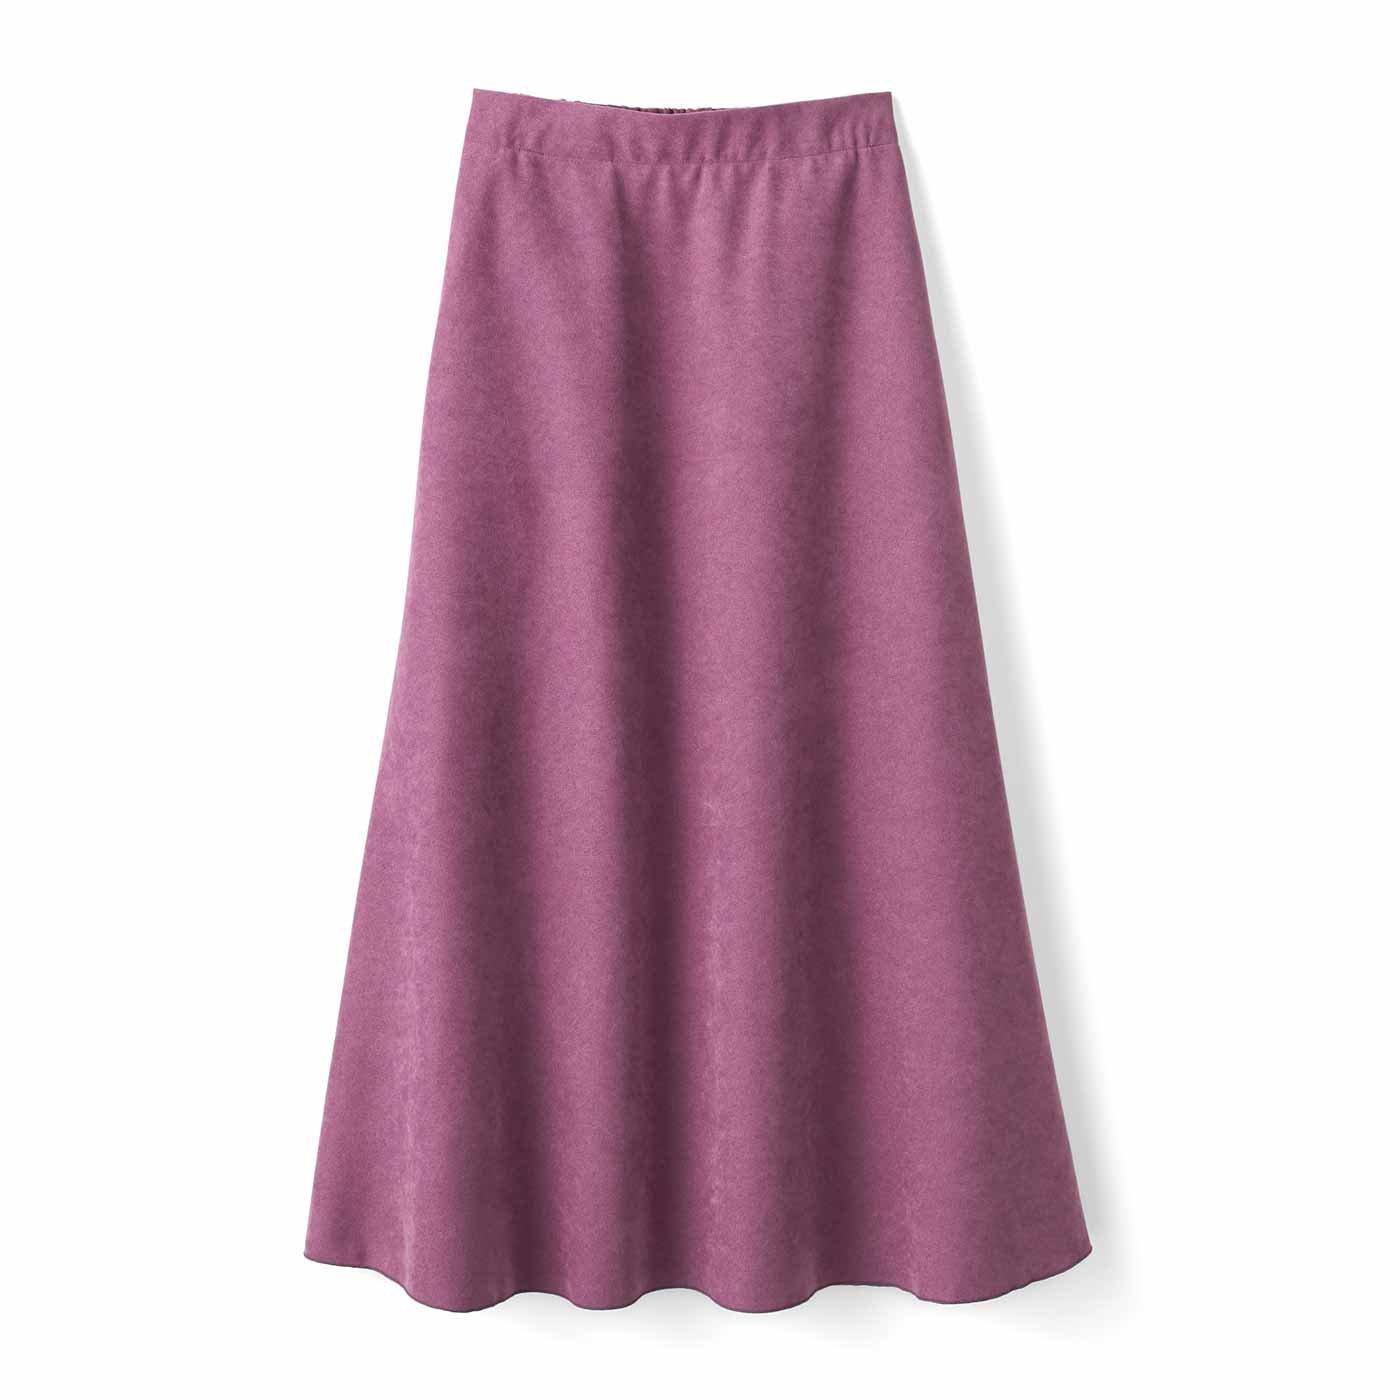 IEDIT[イディット] たっぷりフレアーがドラマティックなロングスカート〈パープル〉